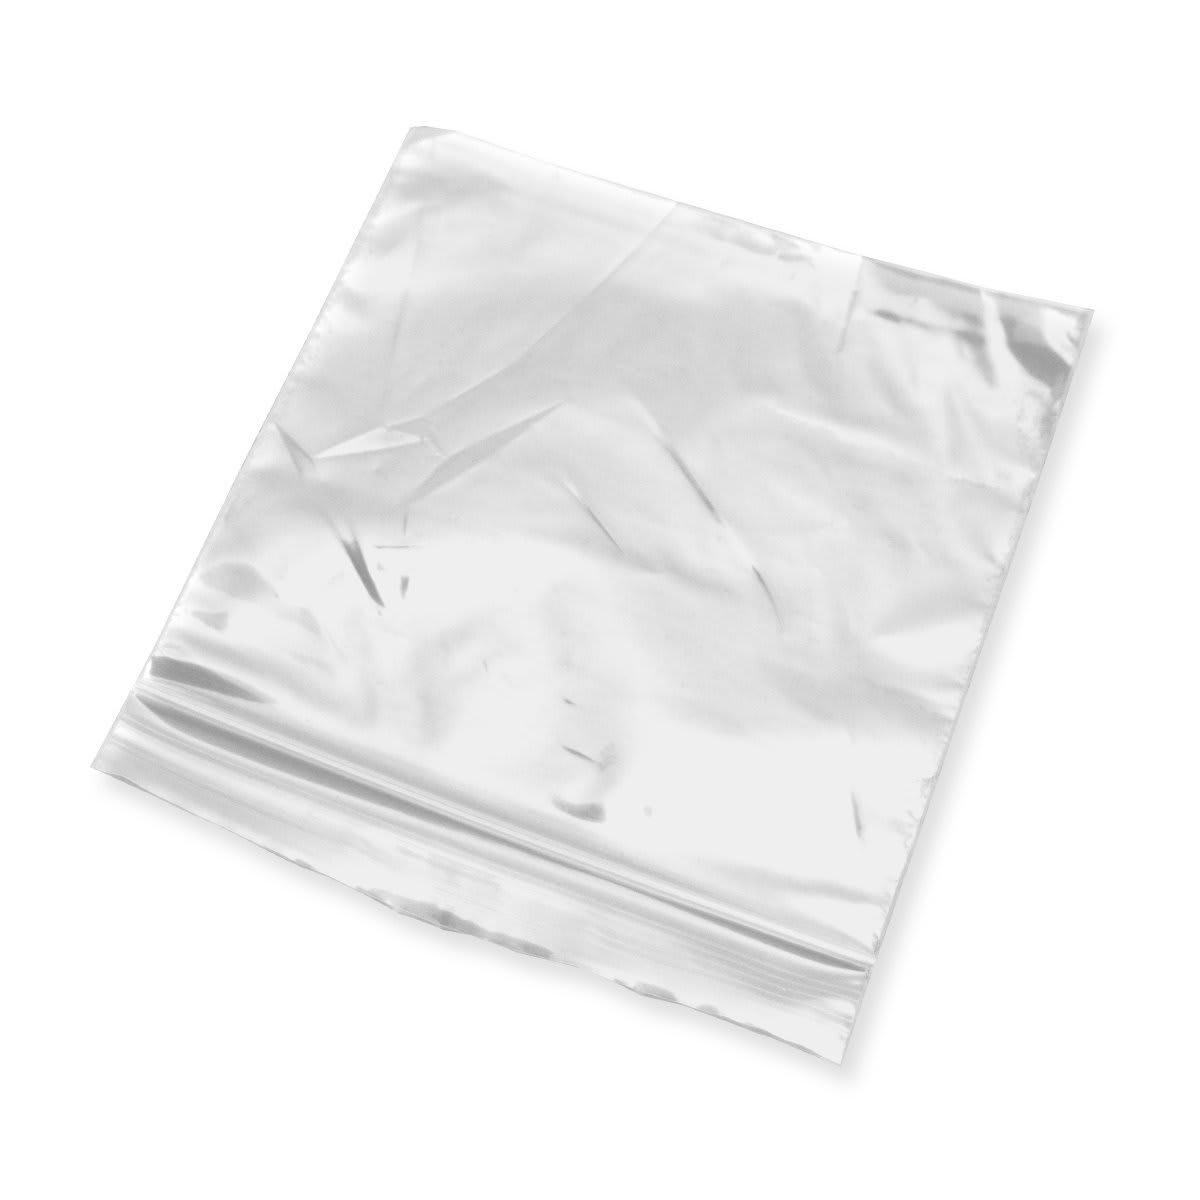 PLAIN POLYTHENE GRIP SEAL BAGS (90 x 115mm)